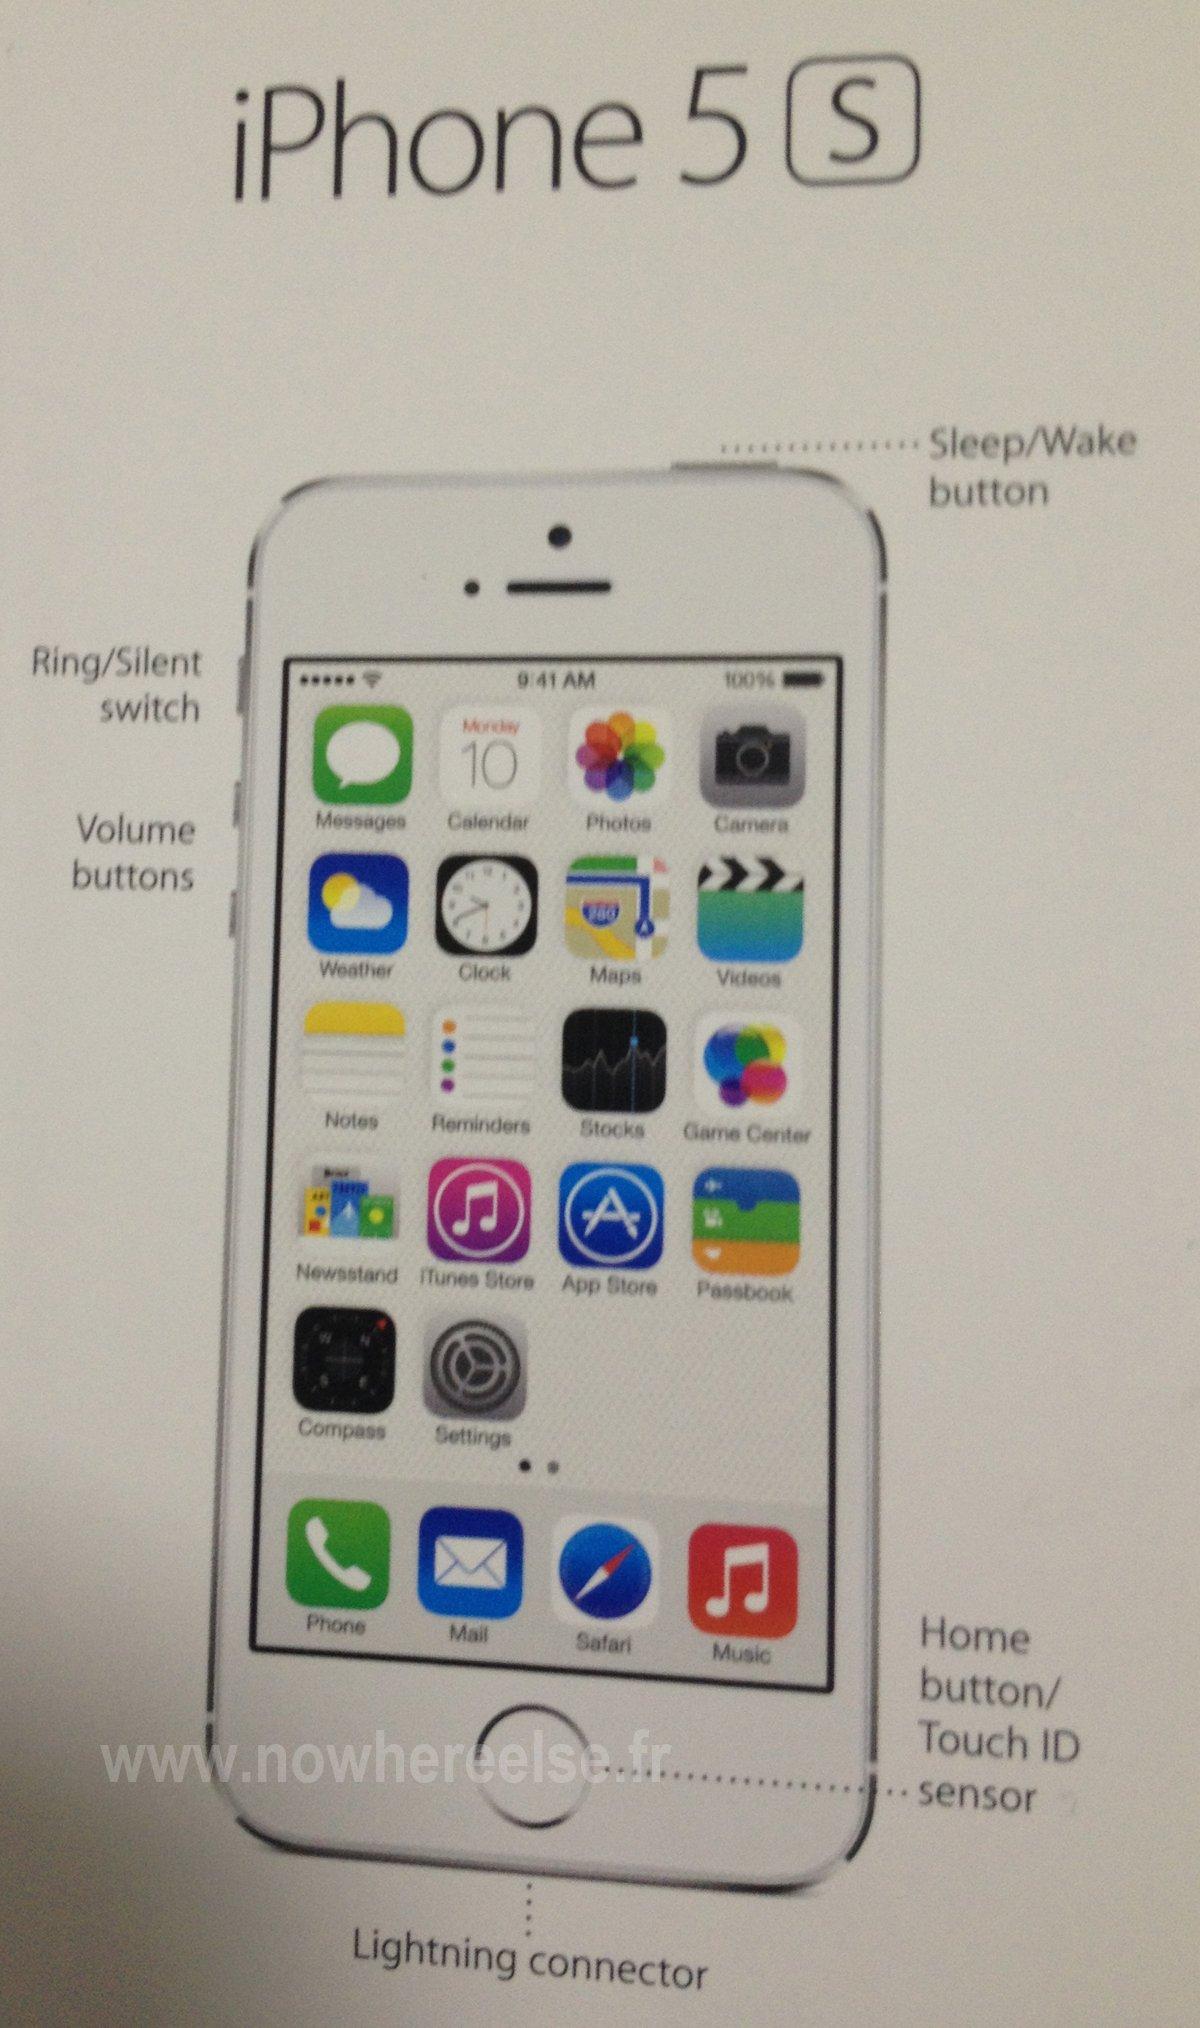 apple store iphone 5s prices